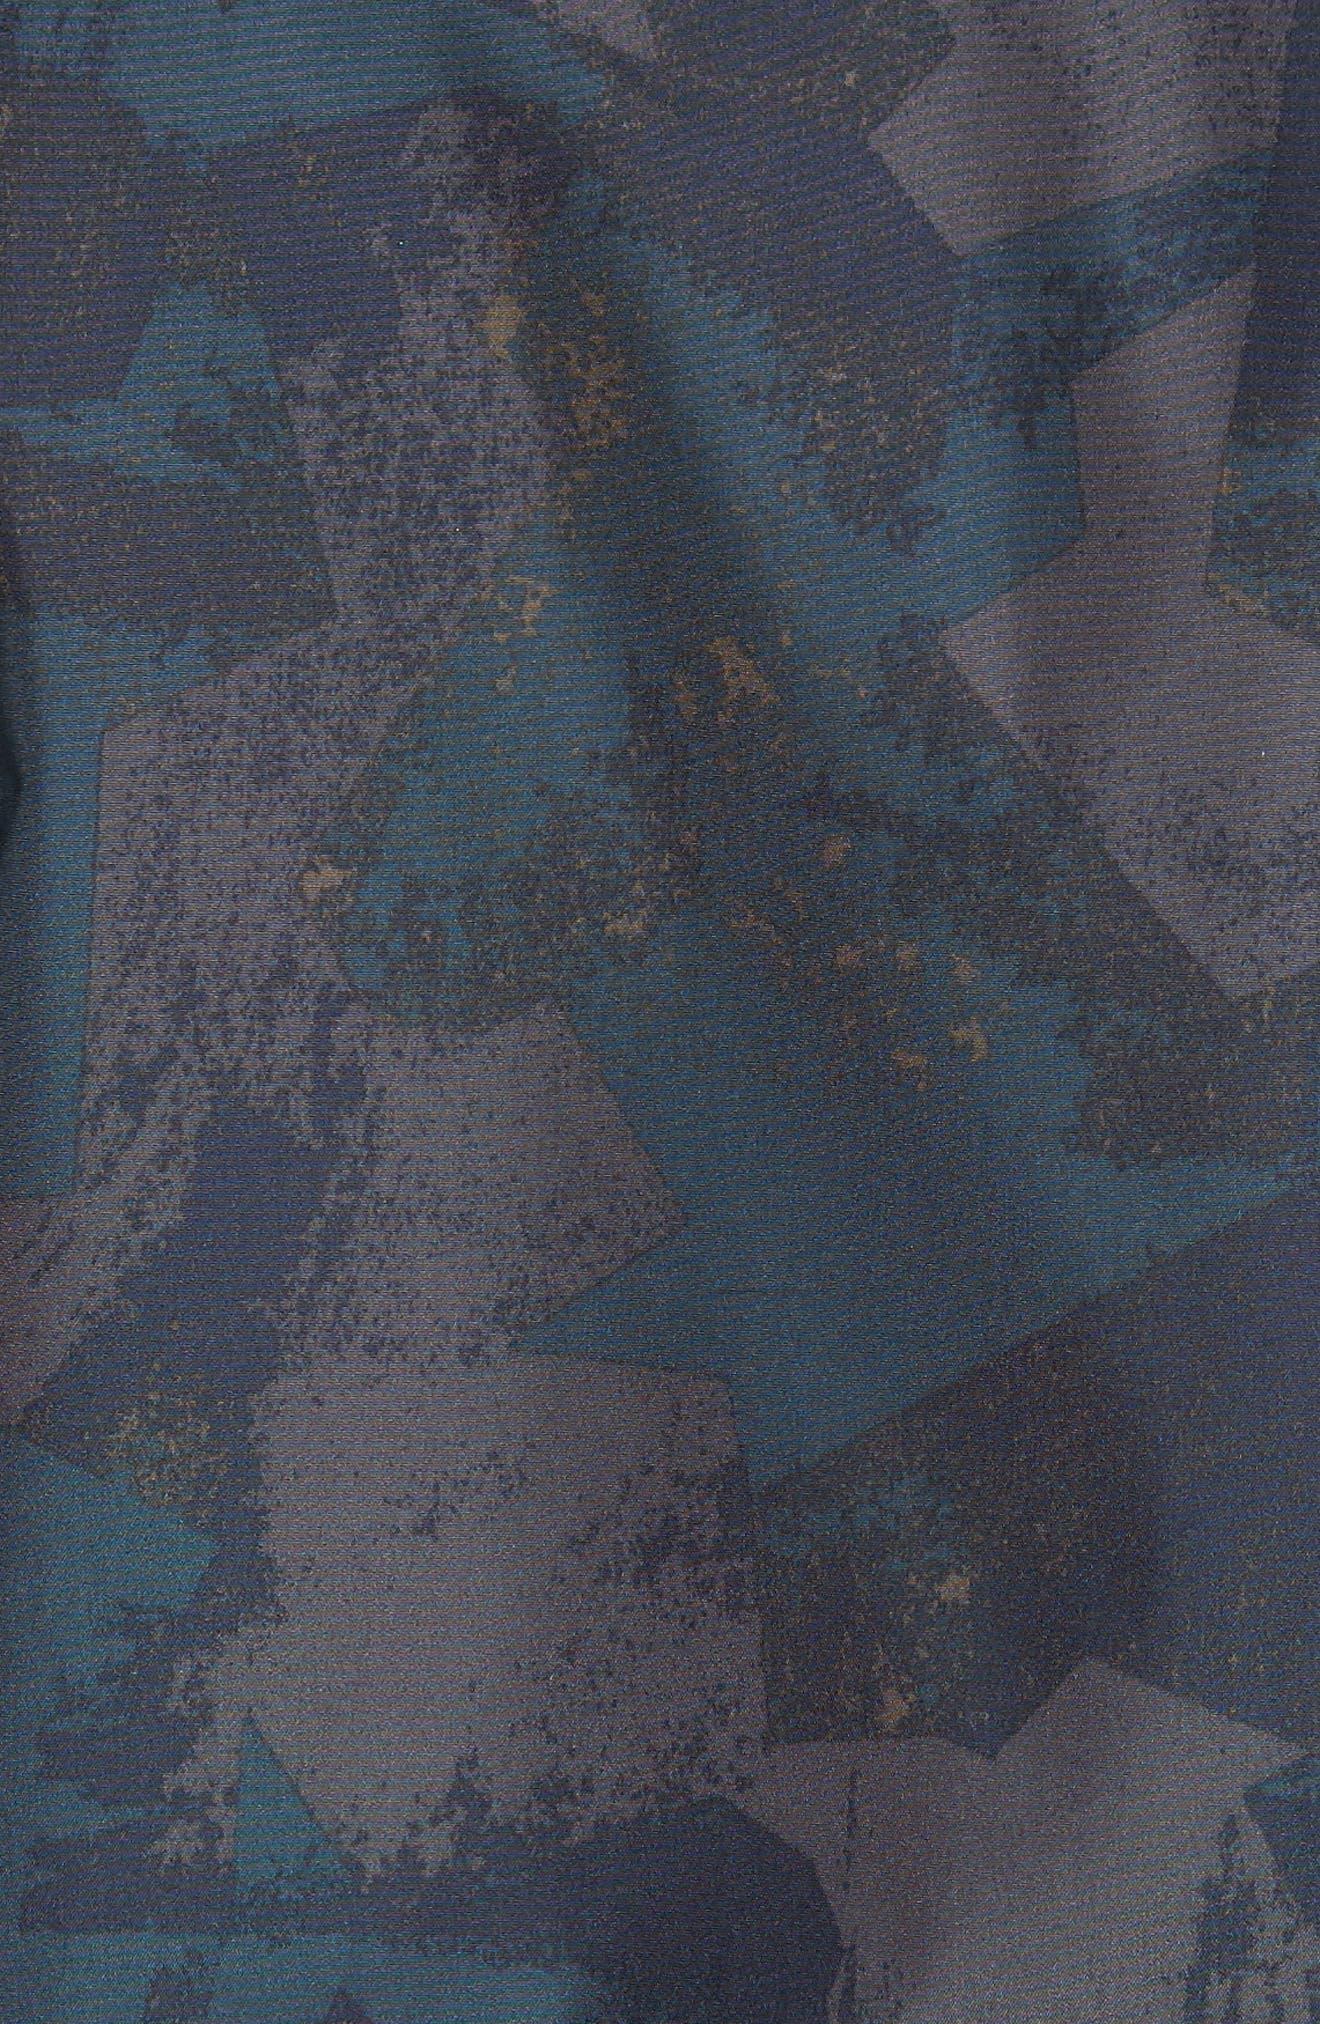 & Bros. Shore Reversible Bomber Jacket,                             Alternate thumbnail 6, color,                             Melton Blue Camo